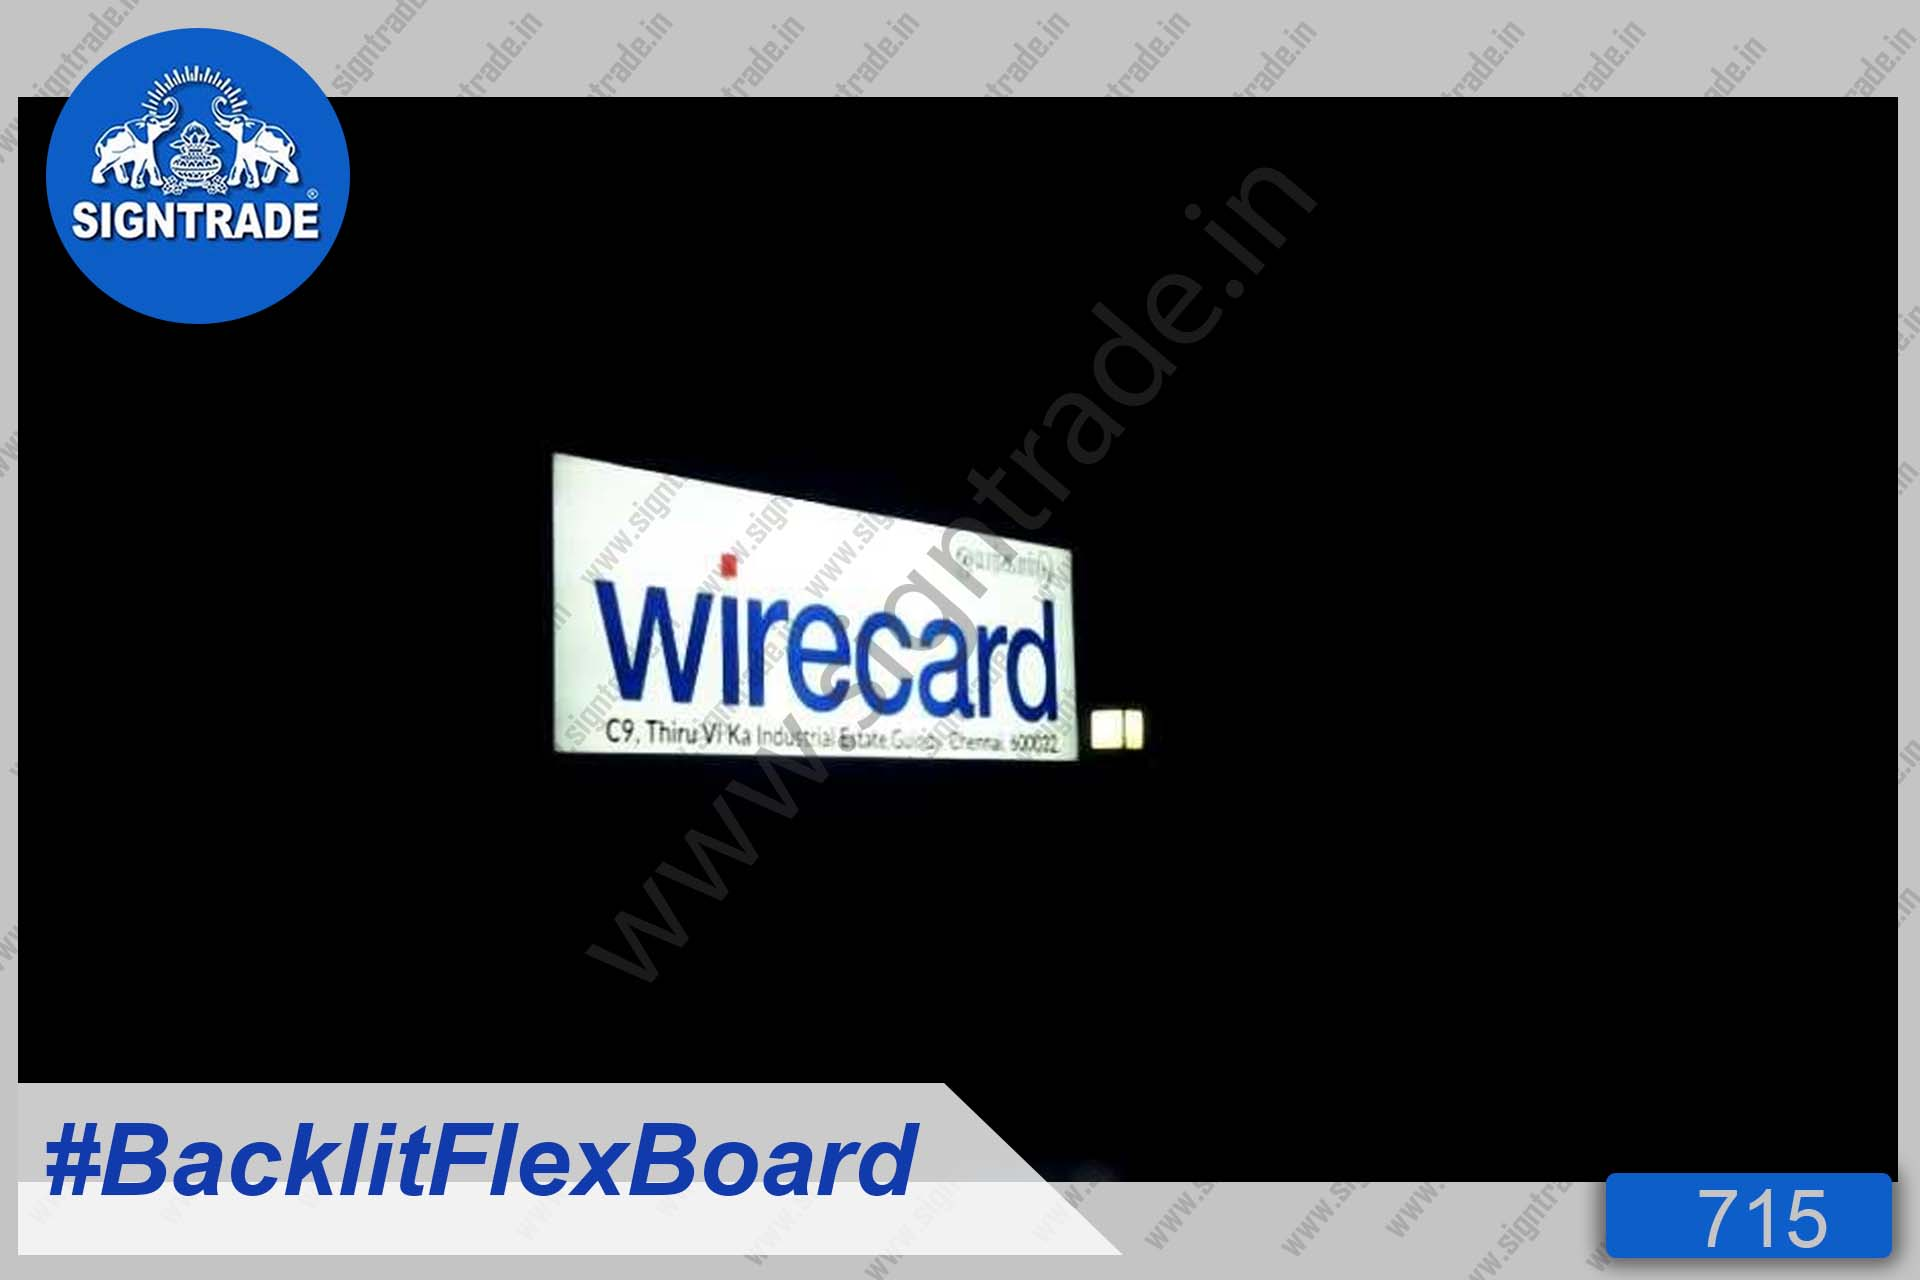 Wirecard Financial services company - Backlit Flex Board